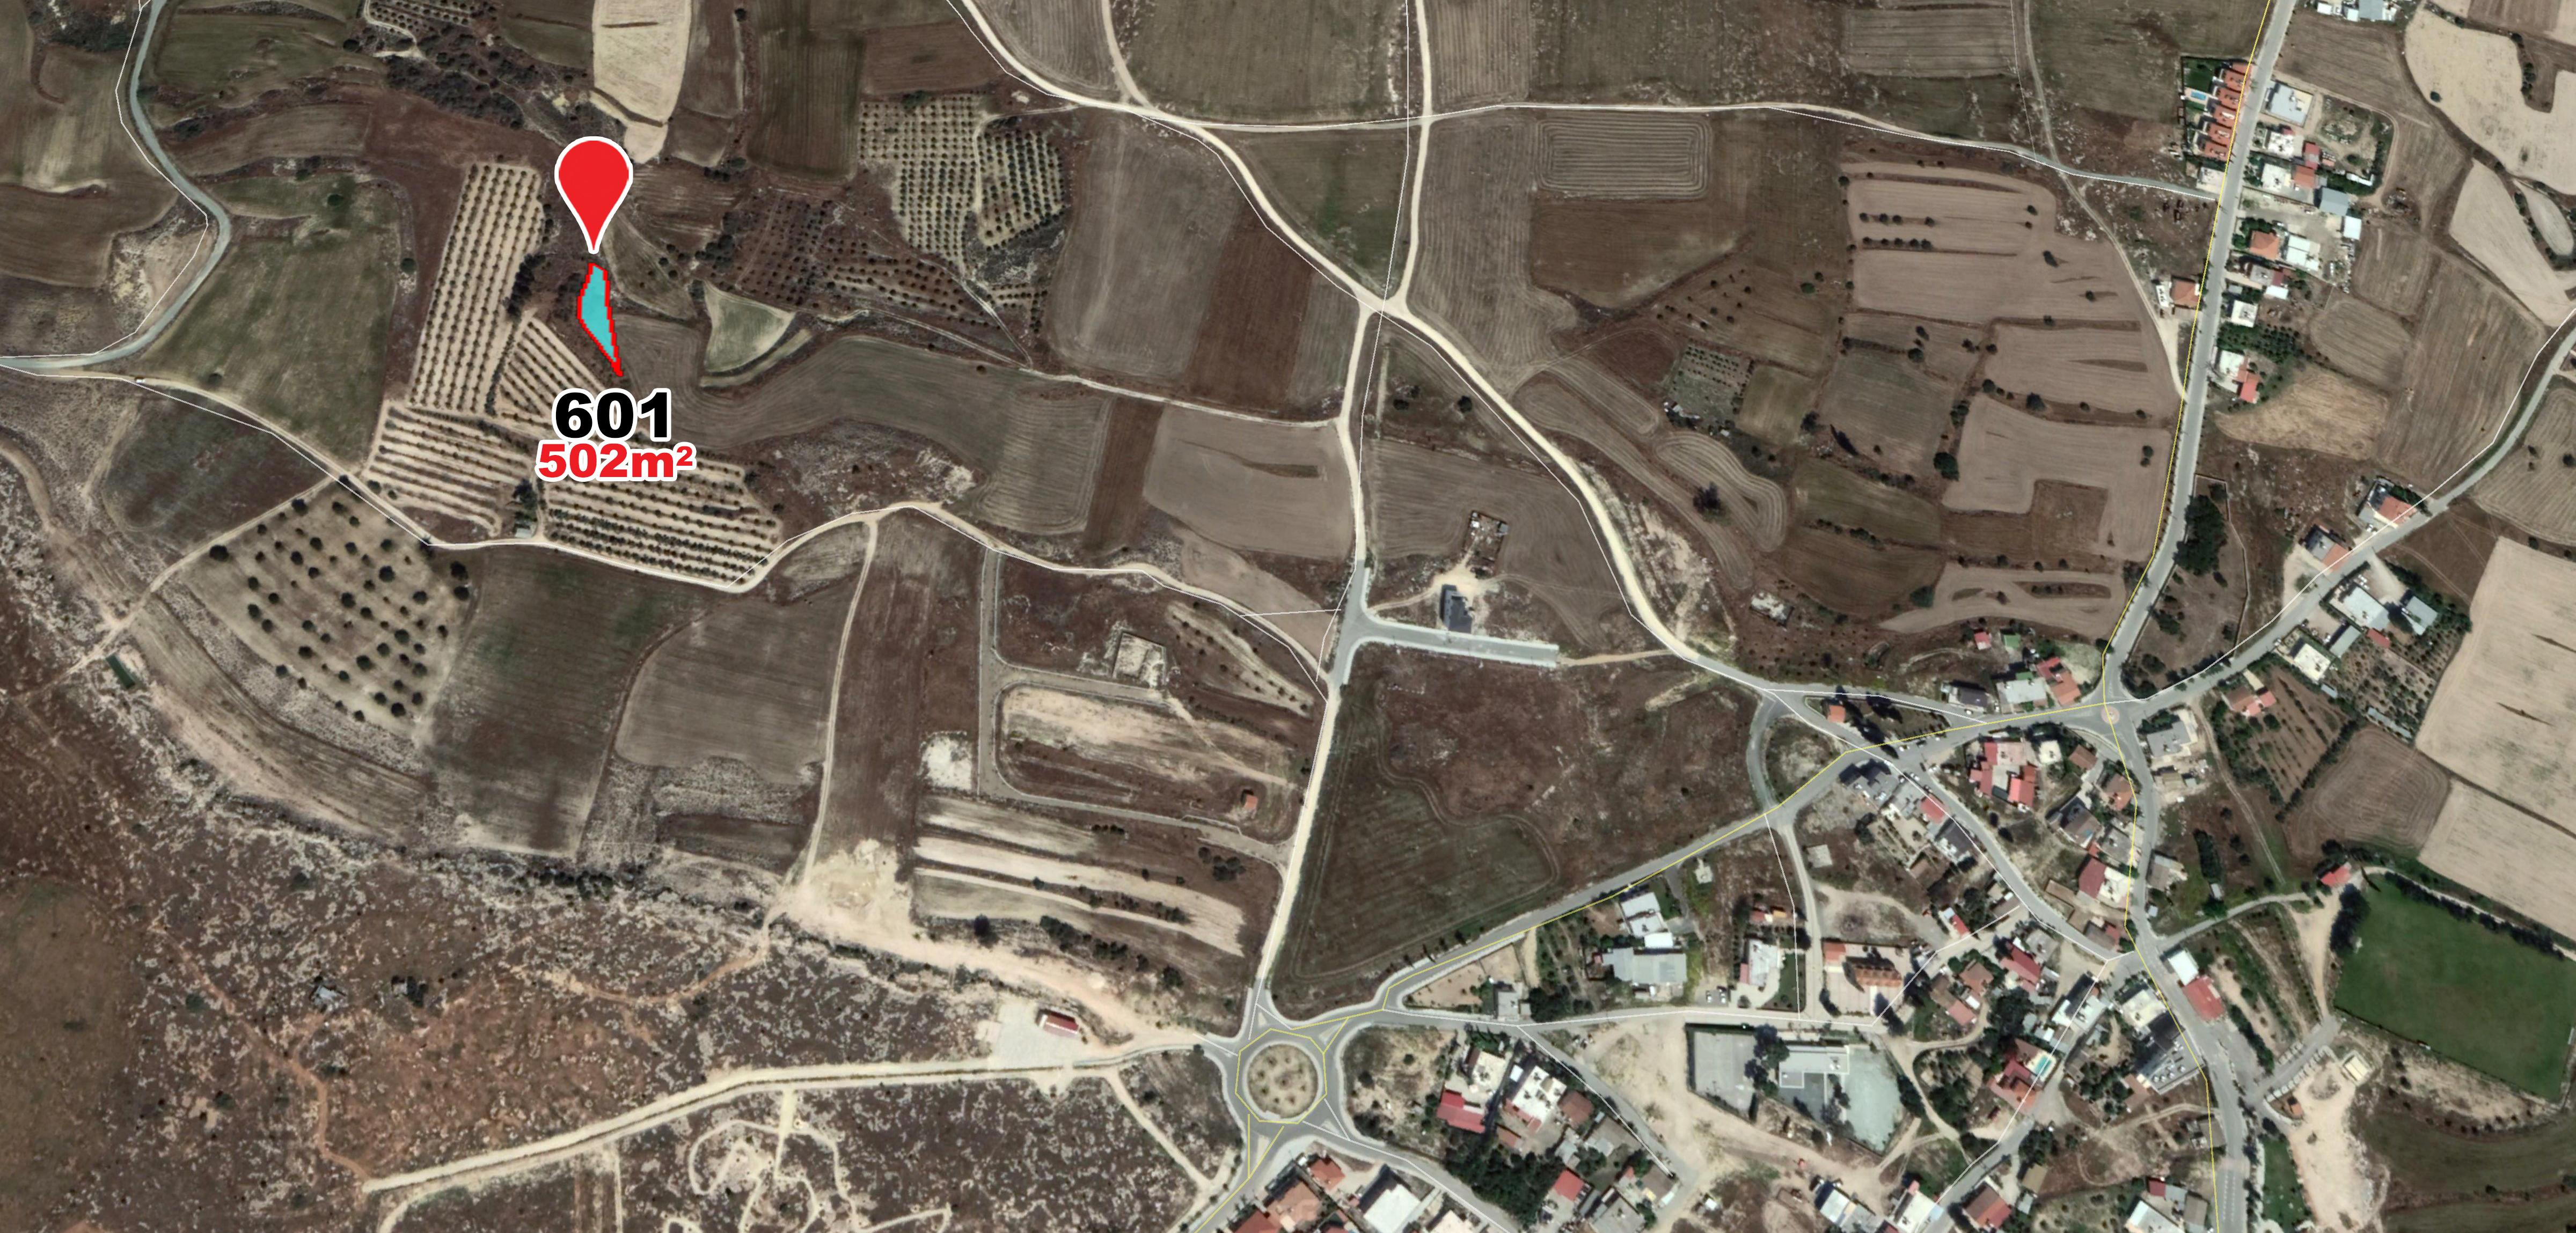 Land Parcel 601 in Deneia  For Sale Nicosia, Deneia